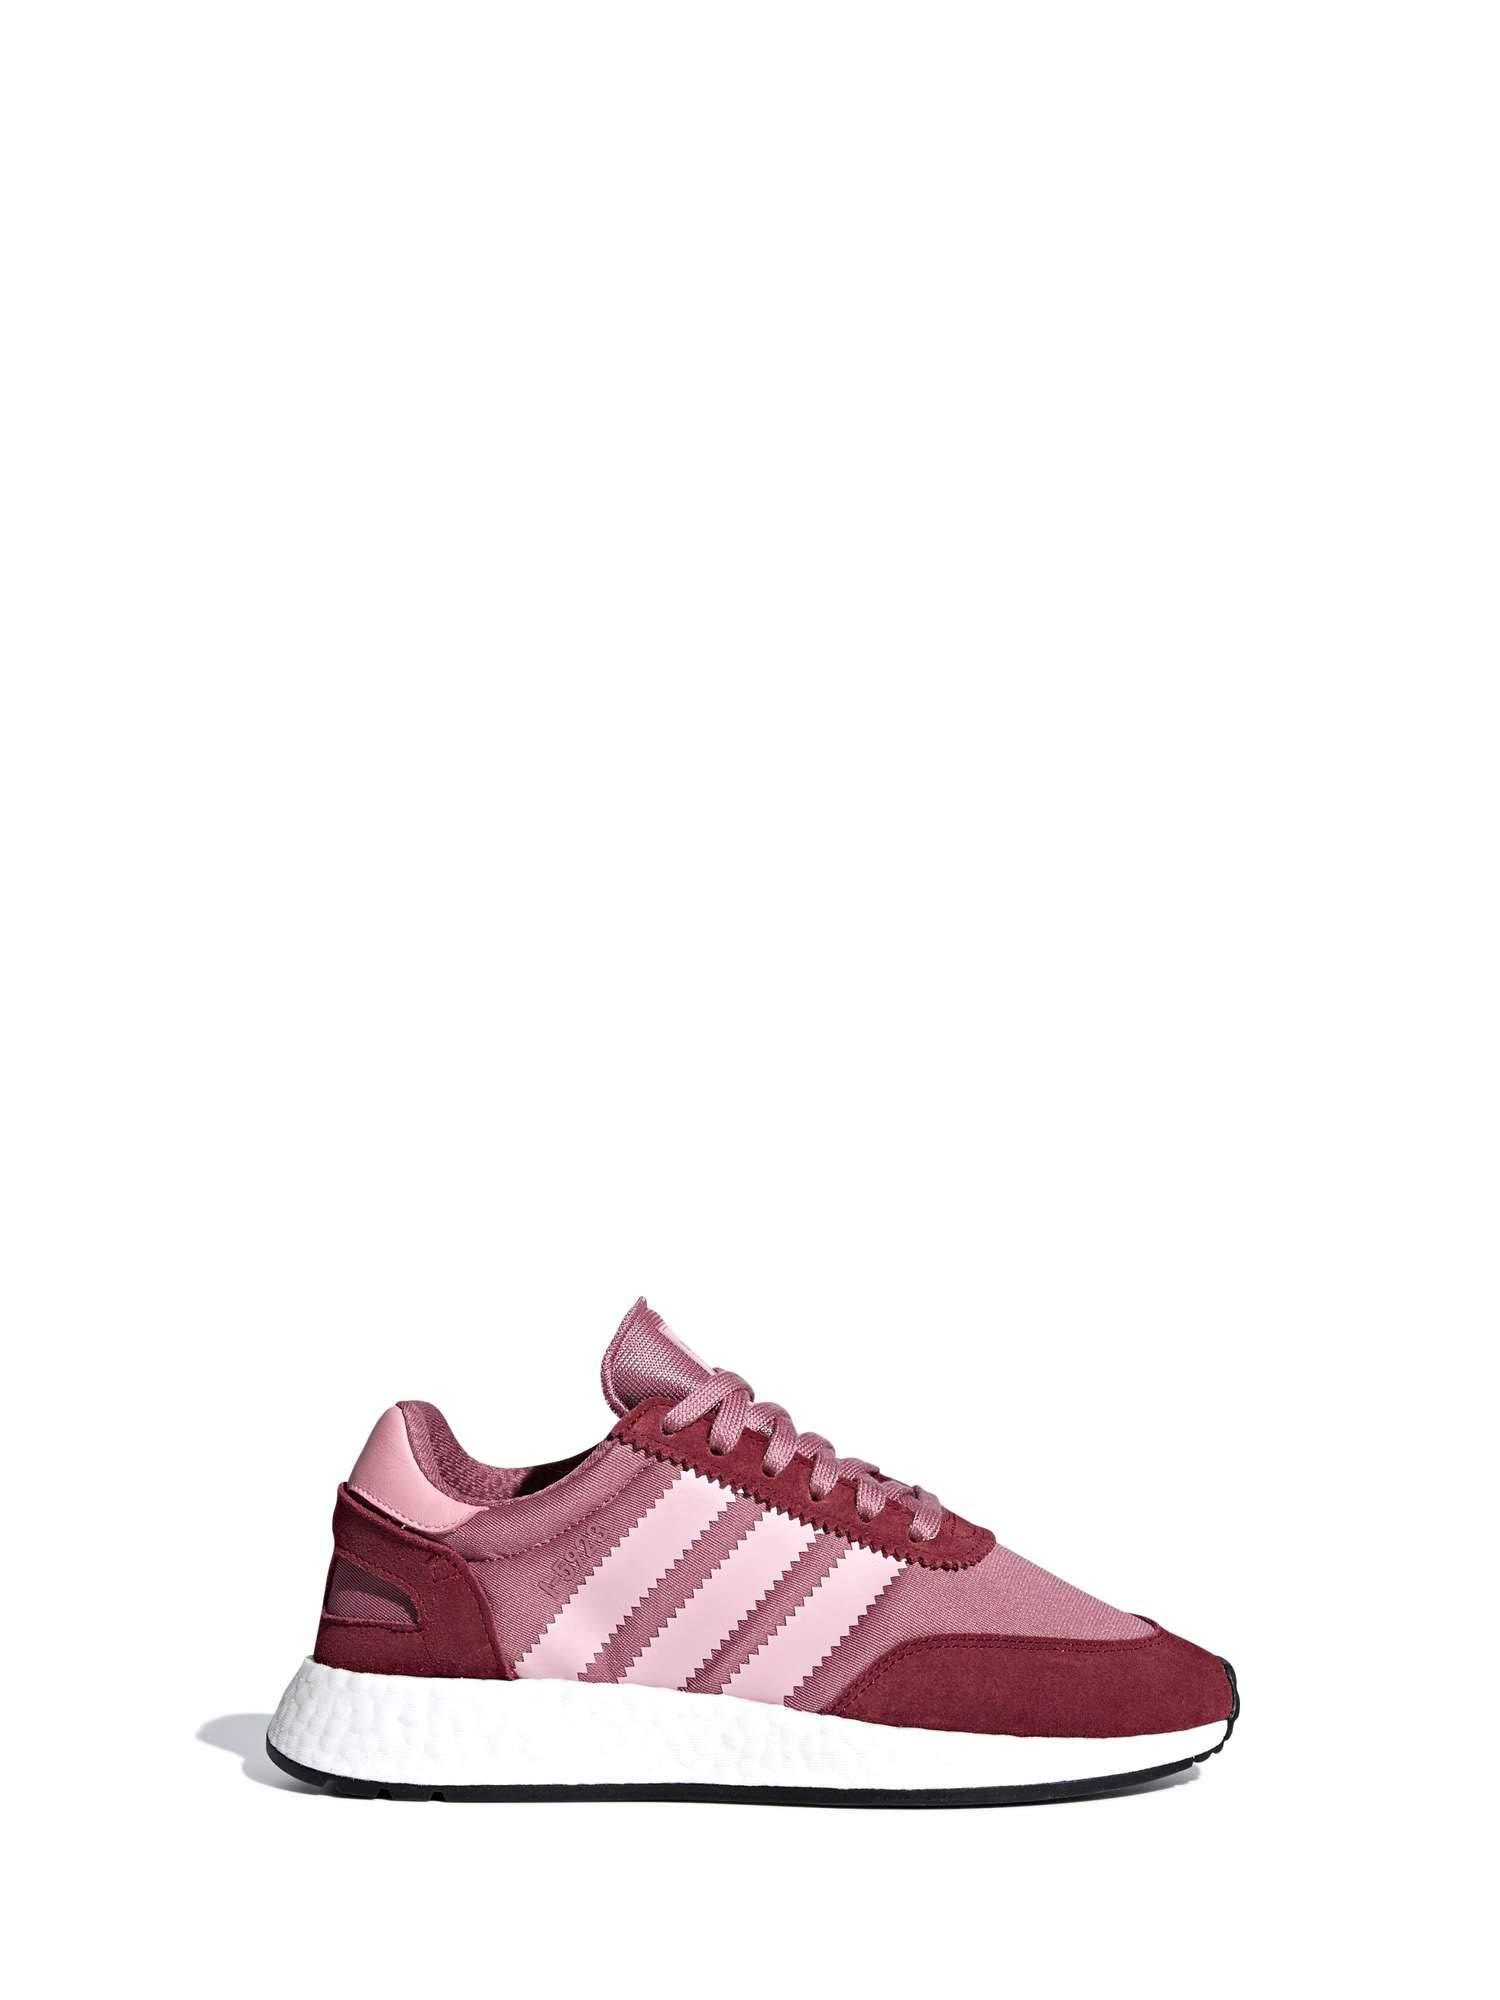 adidas Originals I-5923 Women 1 spesavip